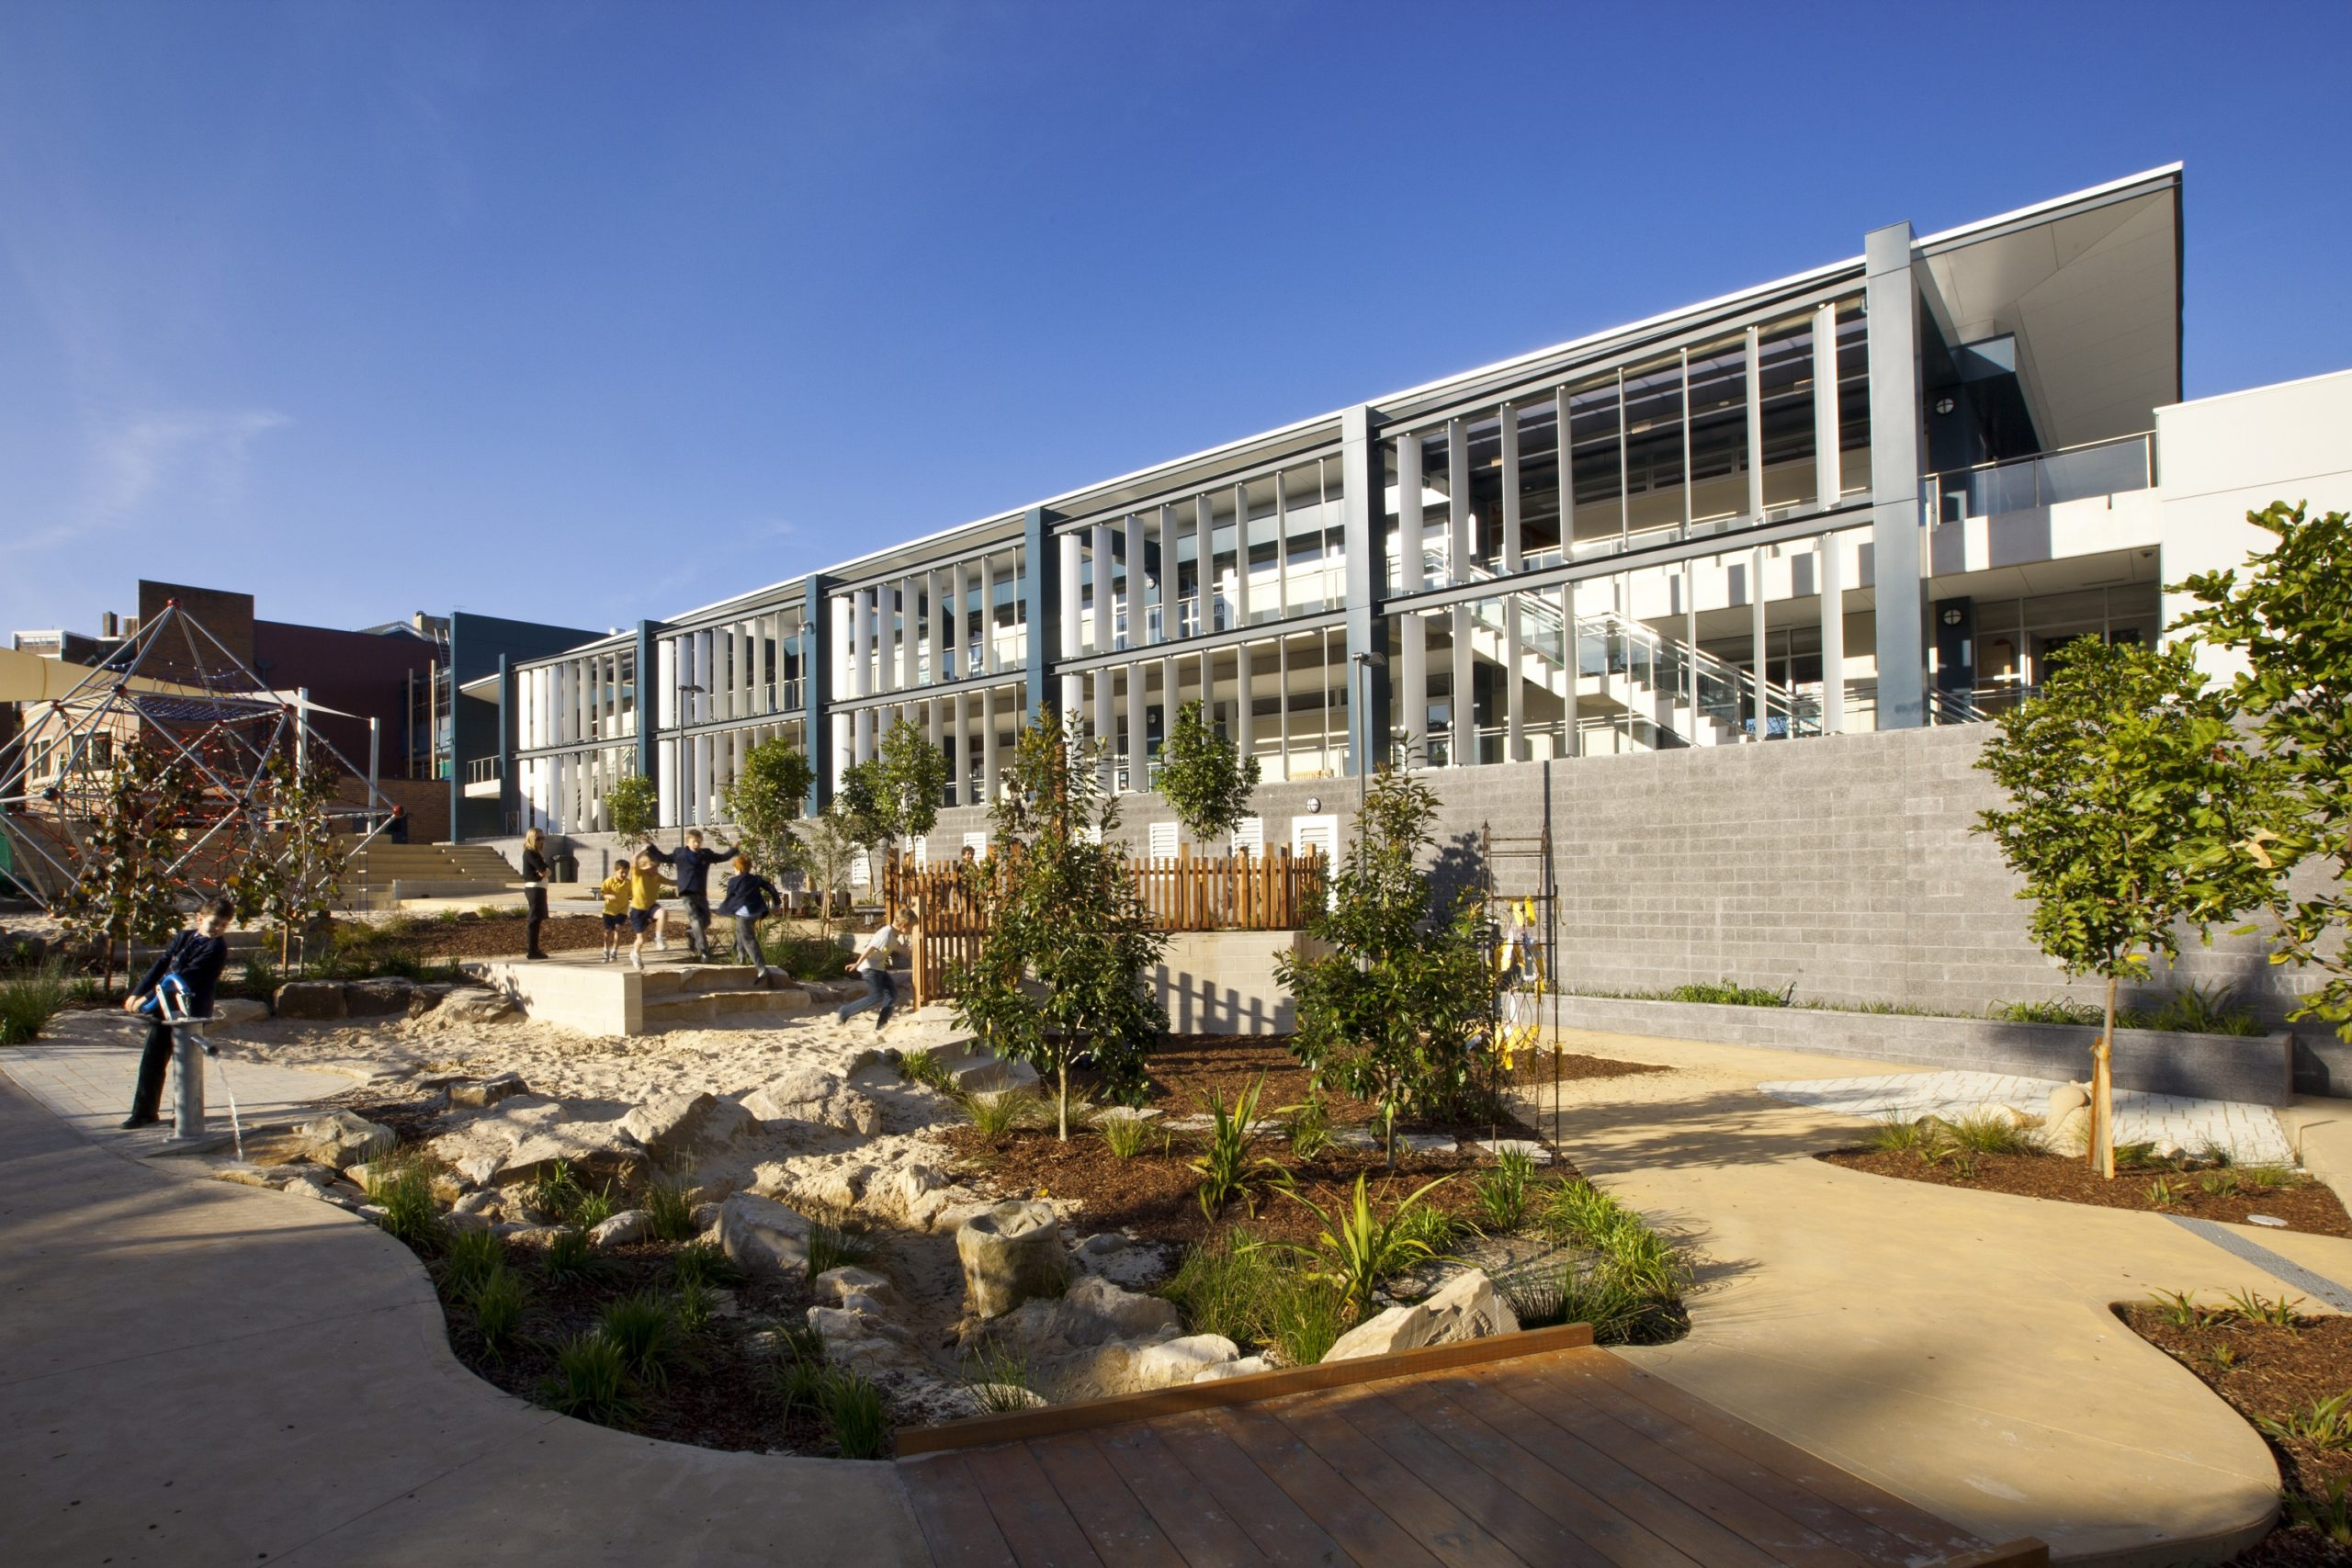 Redlands Preparatory School Exterior Architecture and Play Area – Gardner Wetherill GW 2